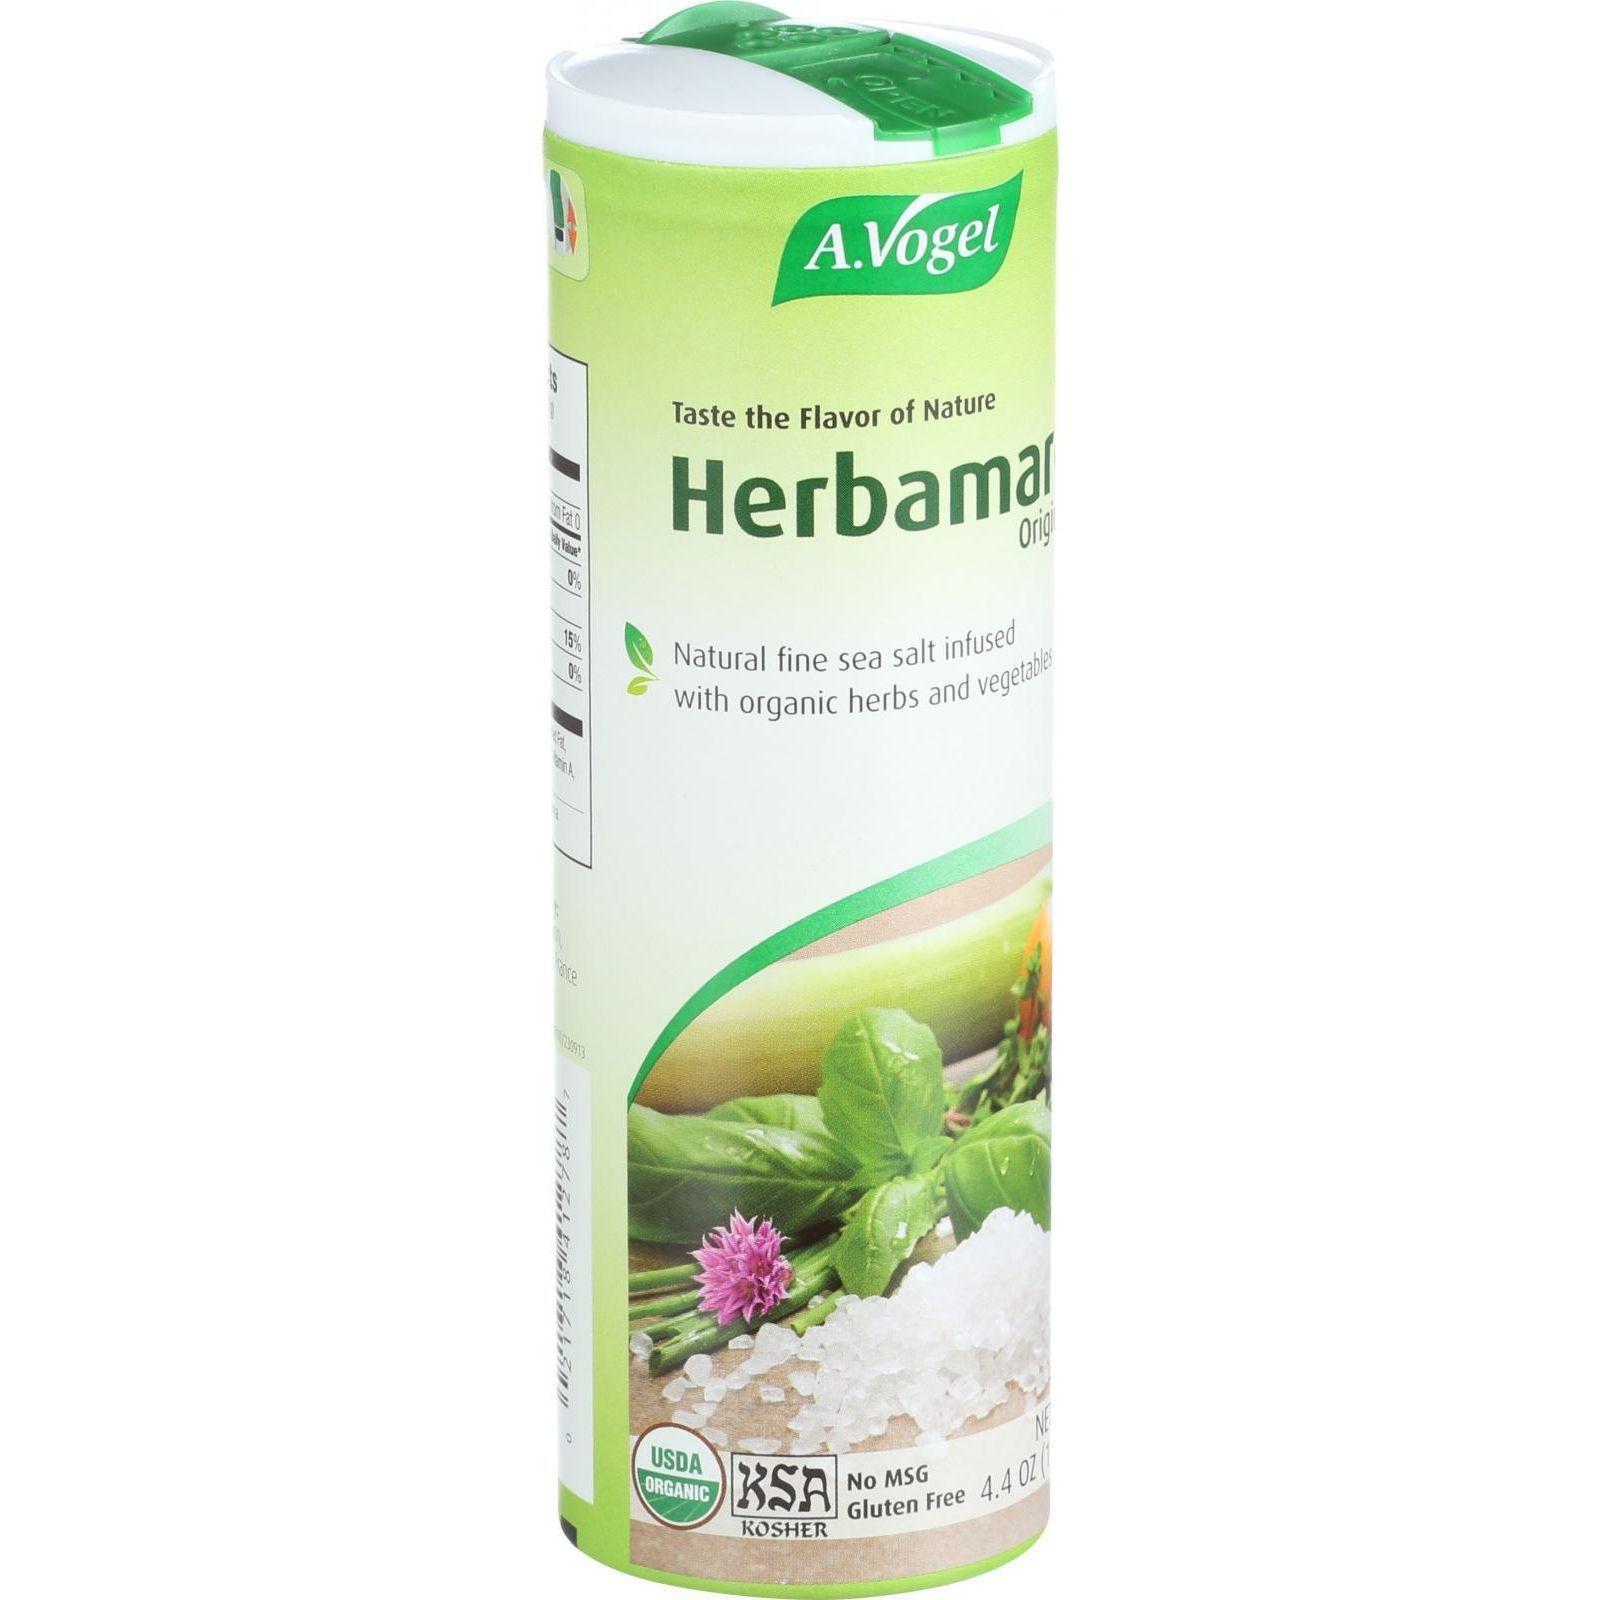 A Vogel Organic Herbamare Seasoning - Original - 4.4 oz